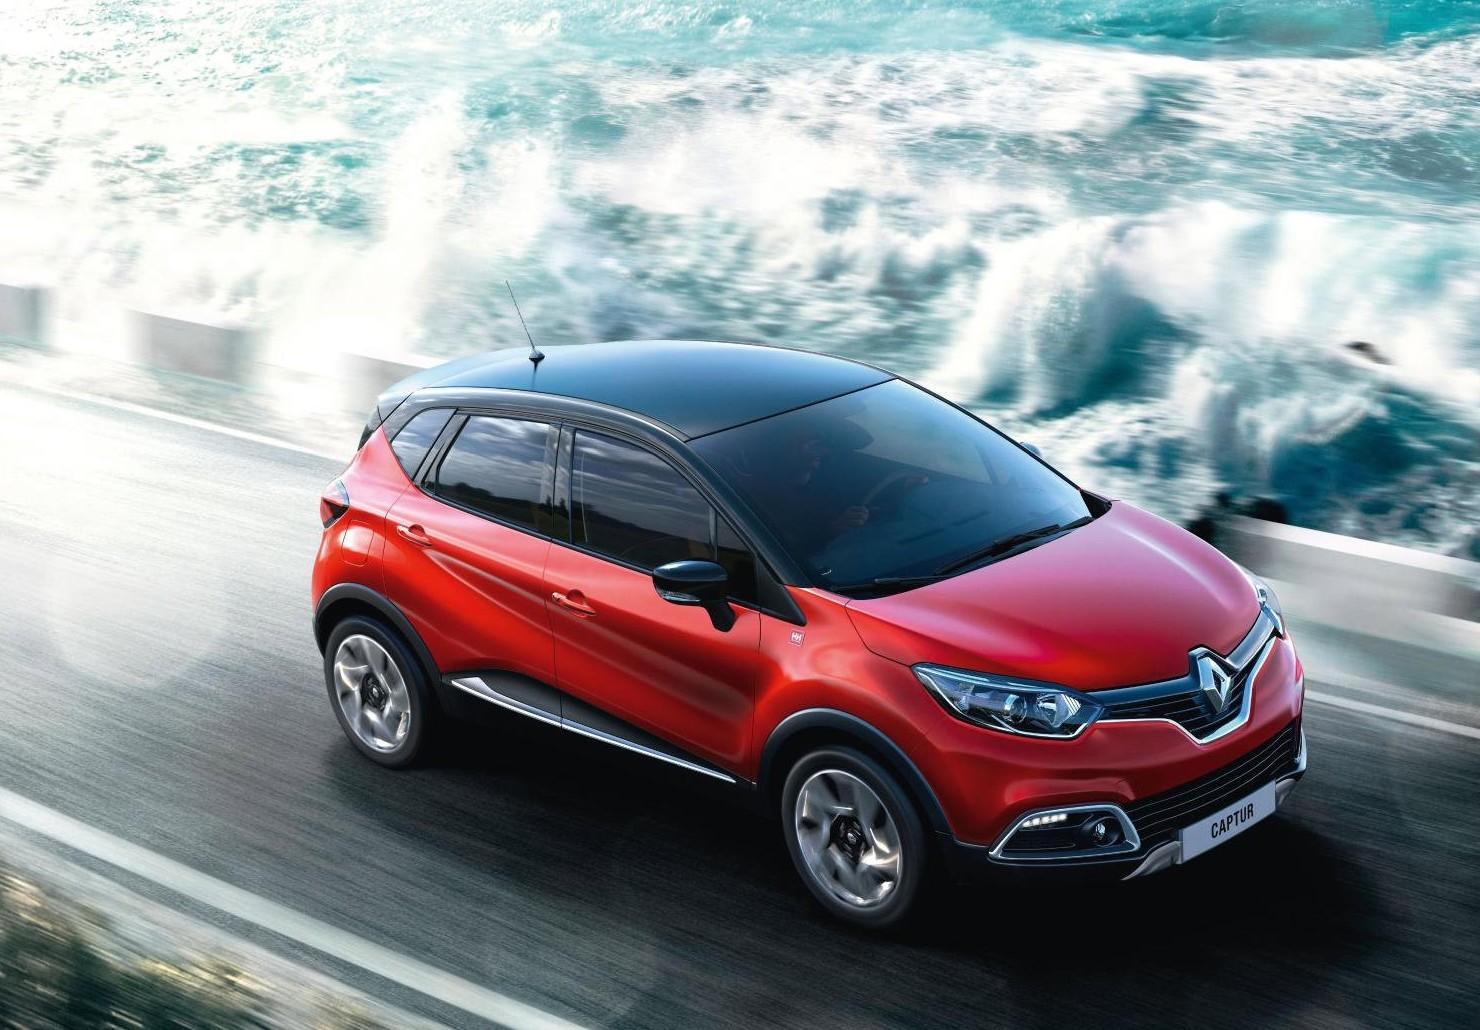 Renault Koleos 2019, Renault Captur 2019